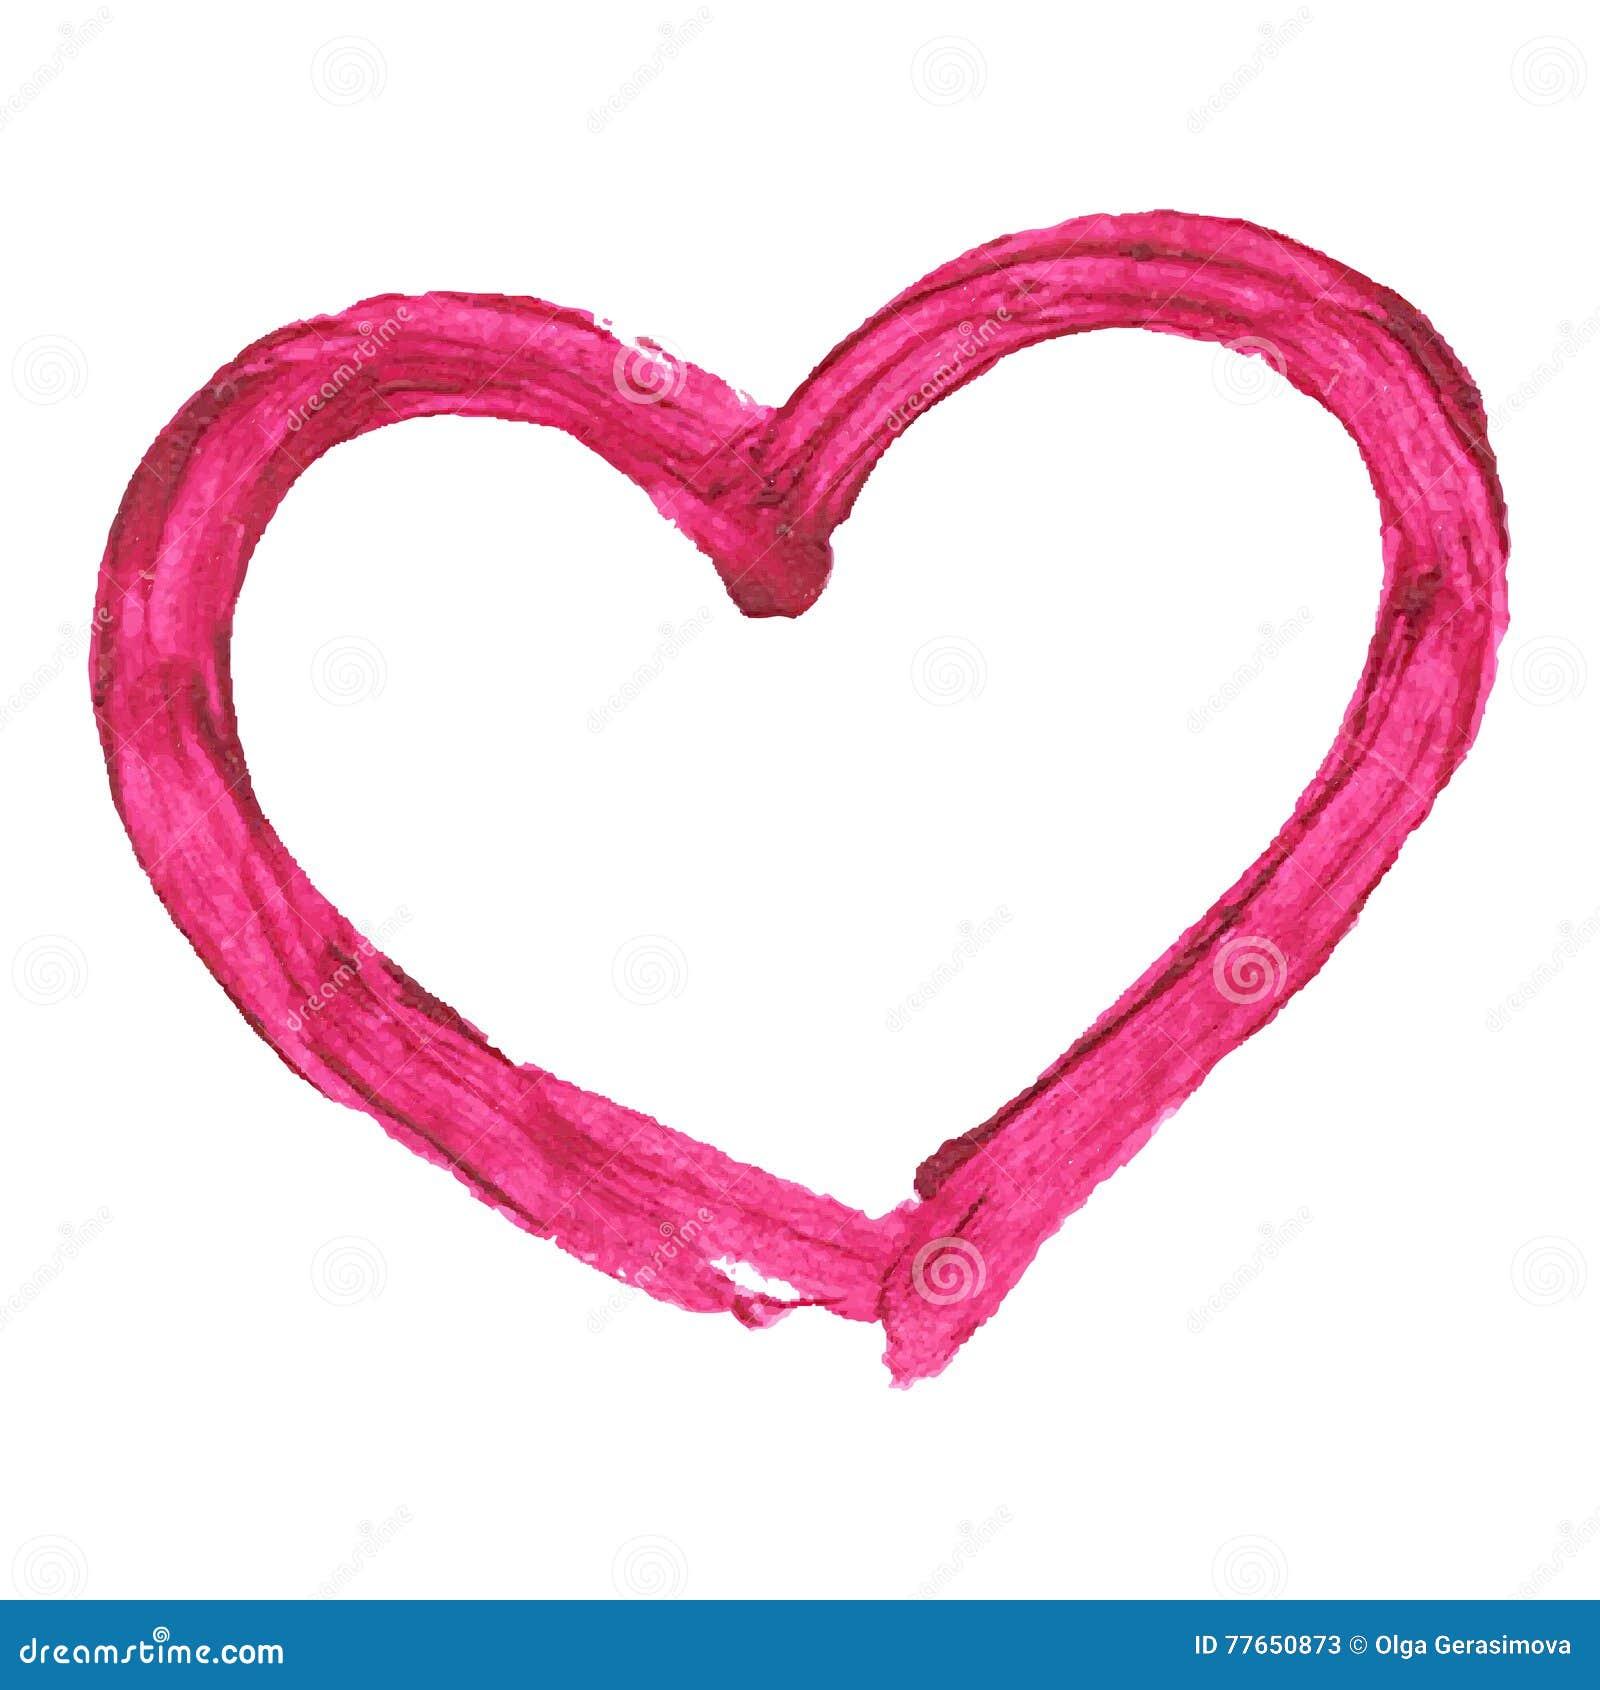 Brush drawing lipstick vector heart, on white